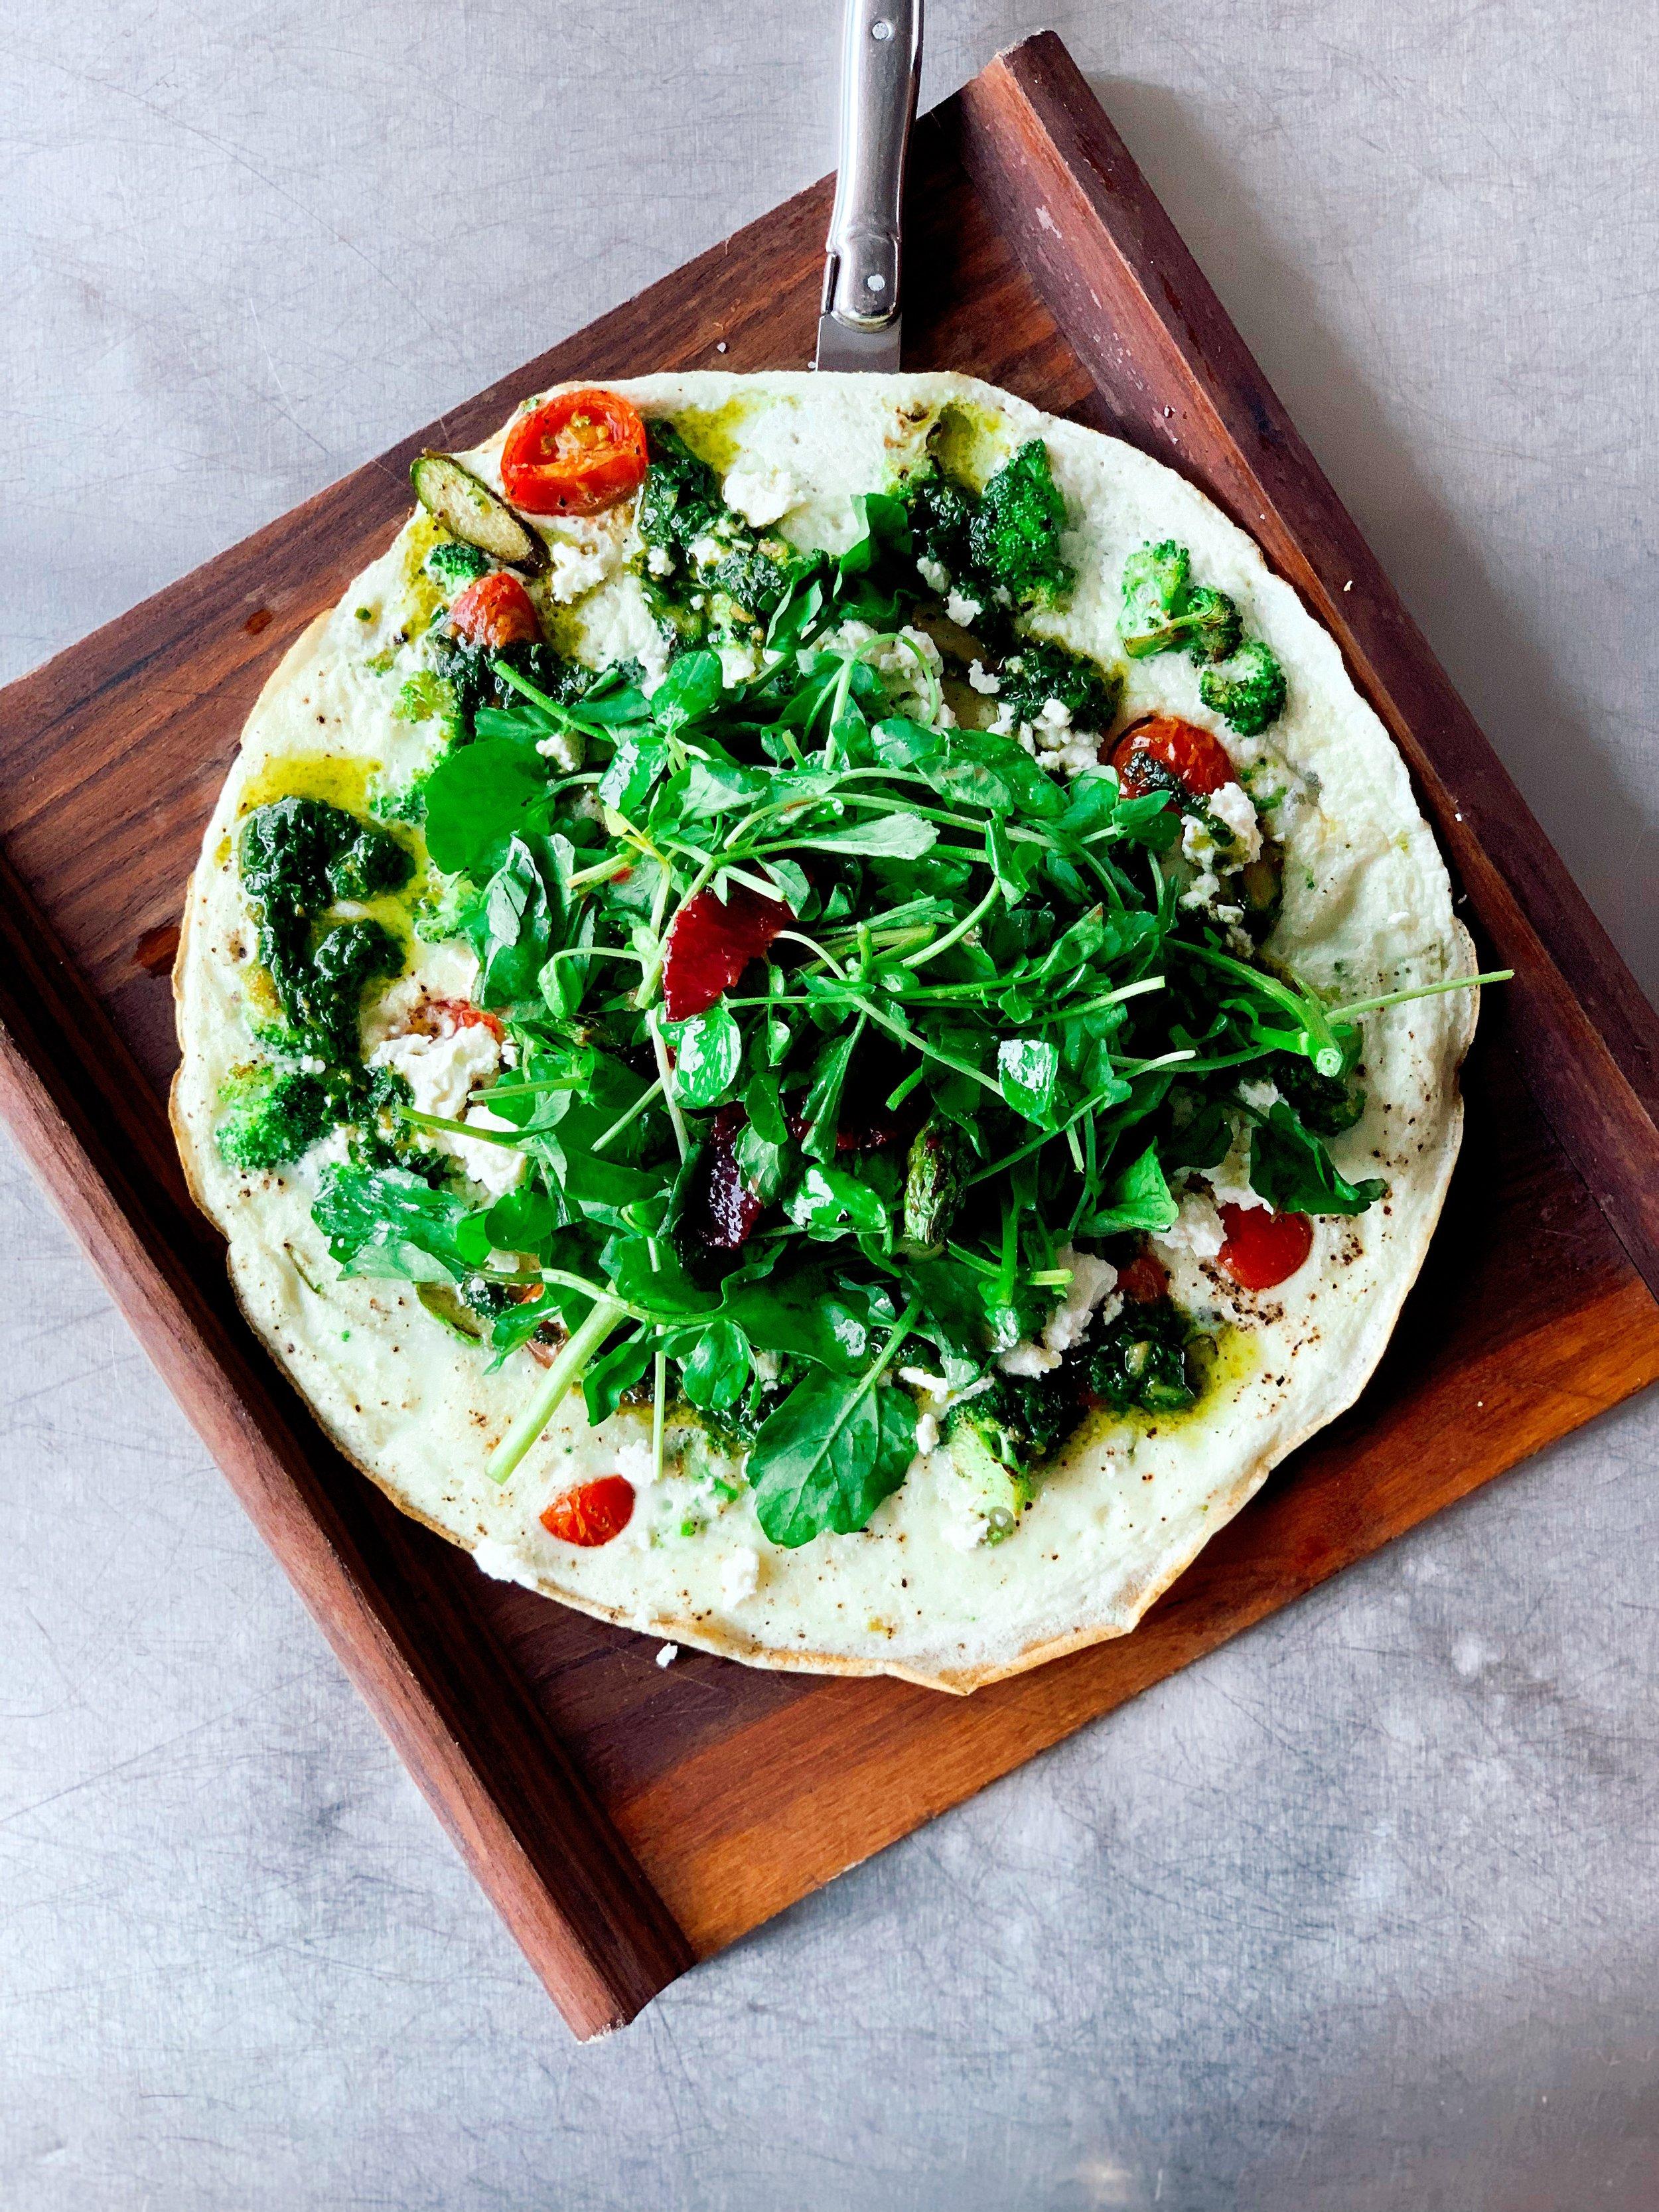 Egg White Frittata | Asparagus + Broccoli + Tomatoes + Feta Cheese + Pistou + Cress Salad